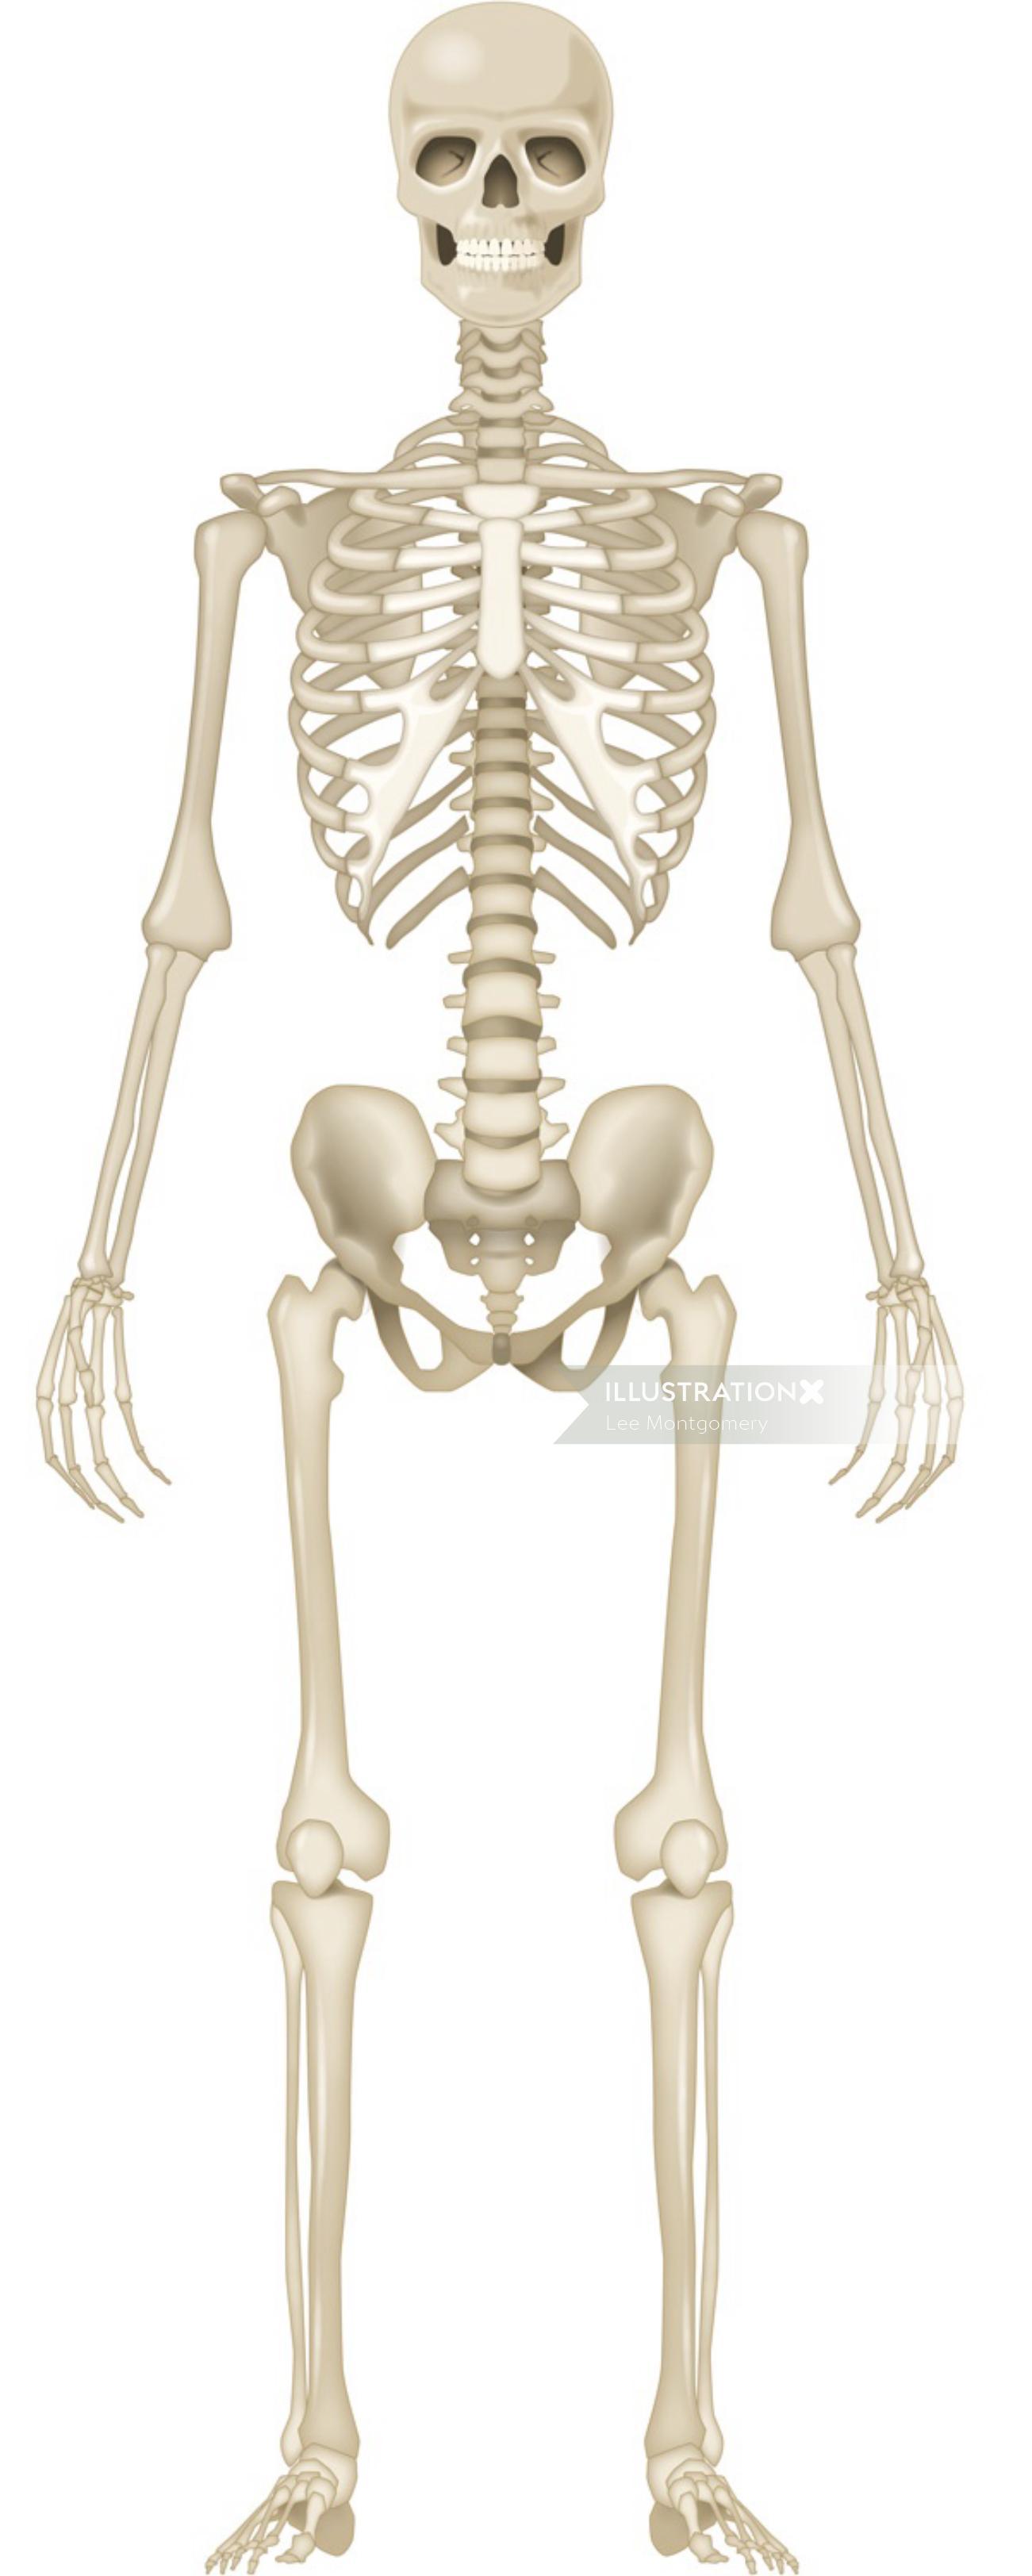 Illustration of human skeleton